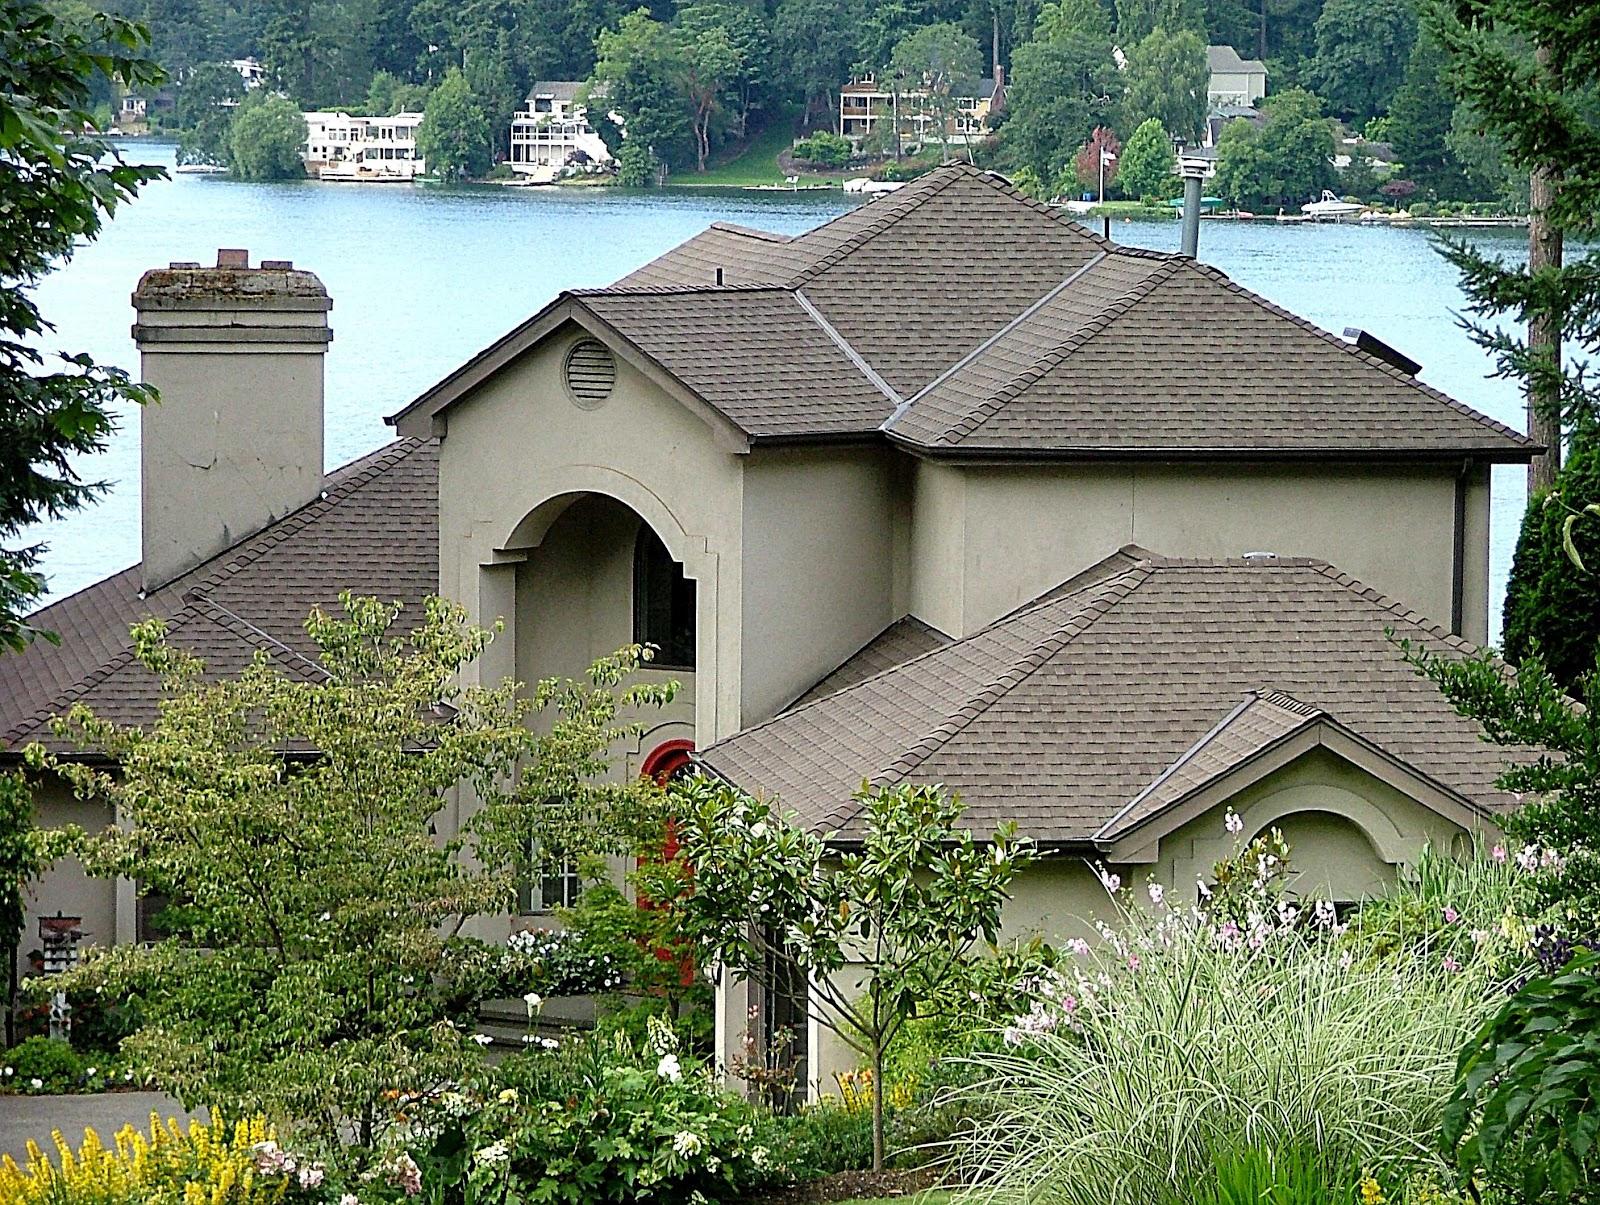 Roofing Redmond WA, Redmond Roofing, Redmond Roofers